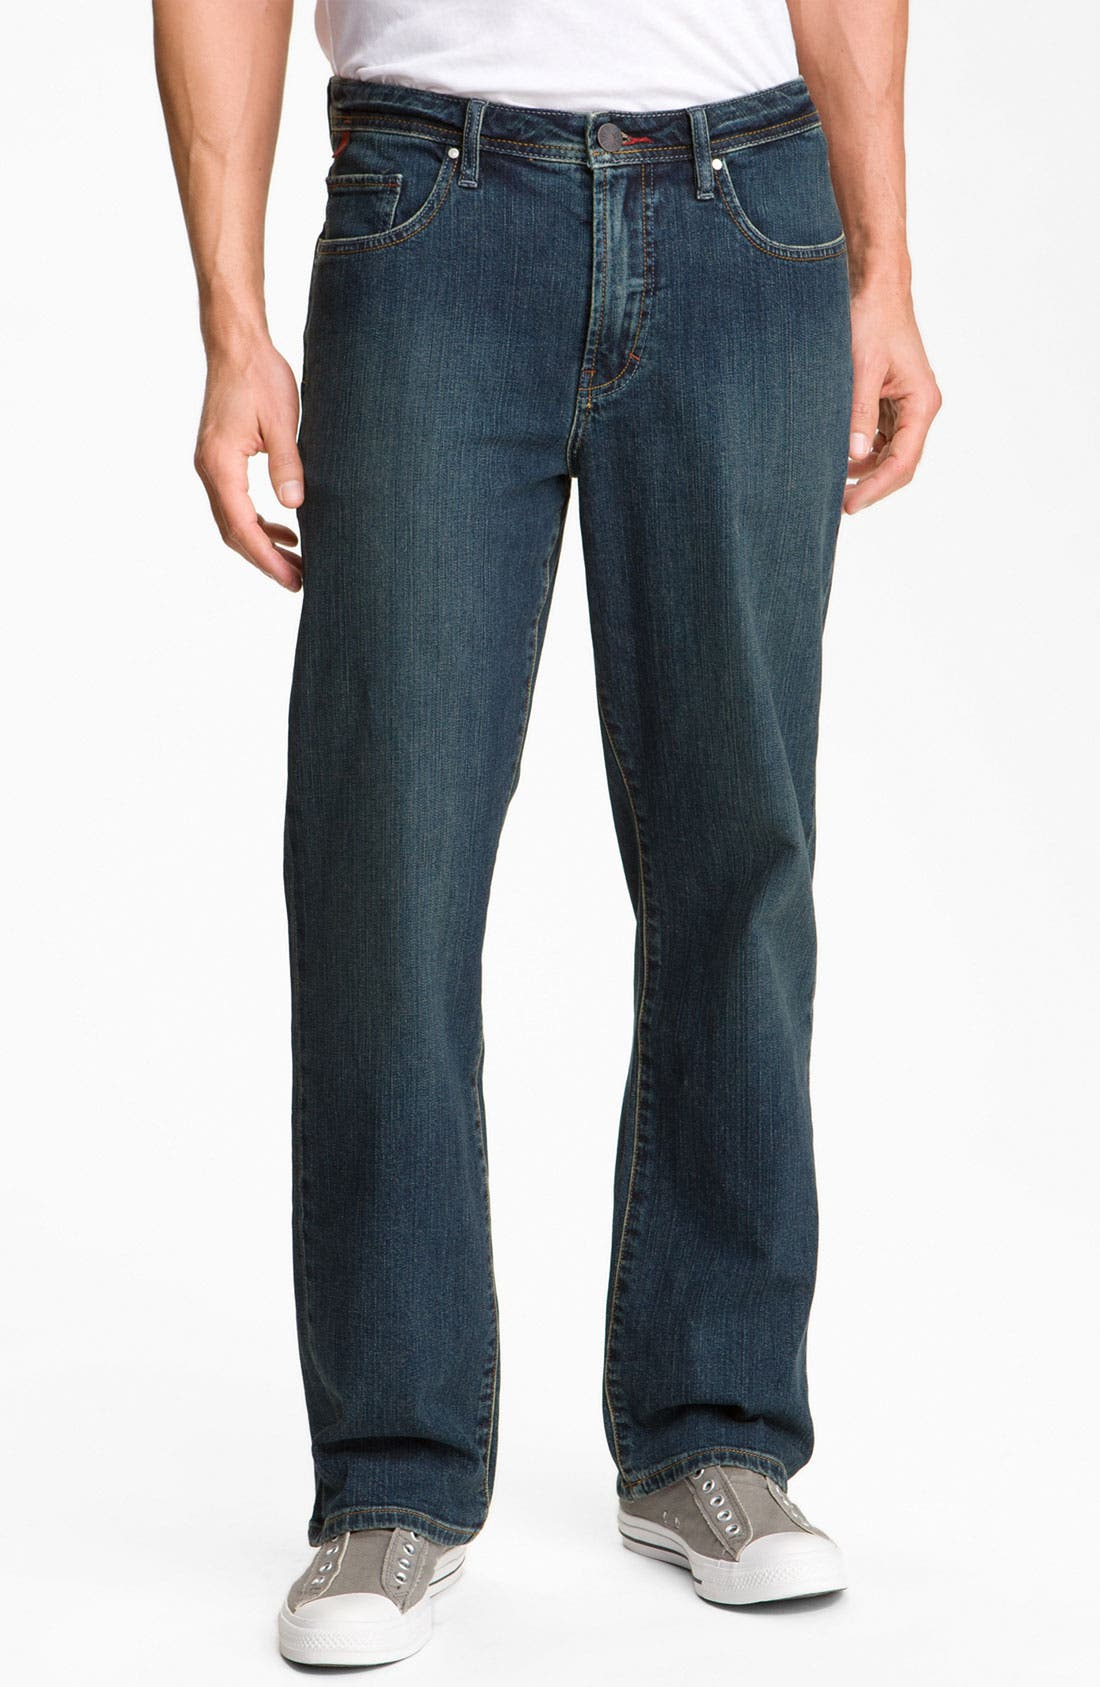 Main Image - Worn Jeans 'Octane' Straight Leg Jeans (Dark Edge)